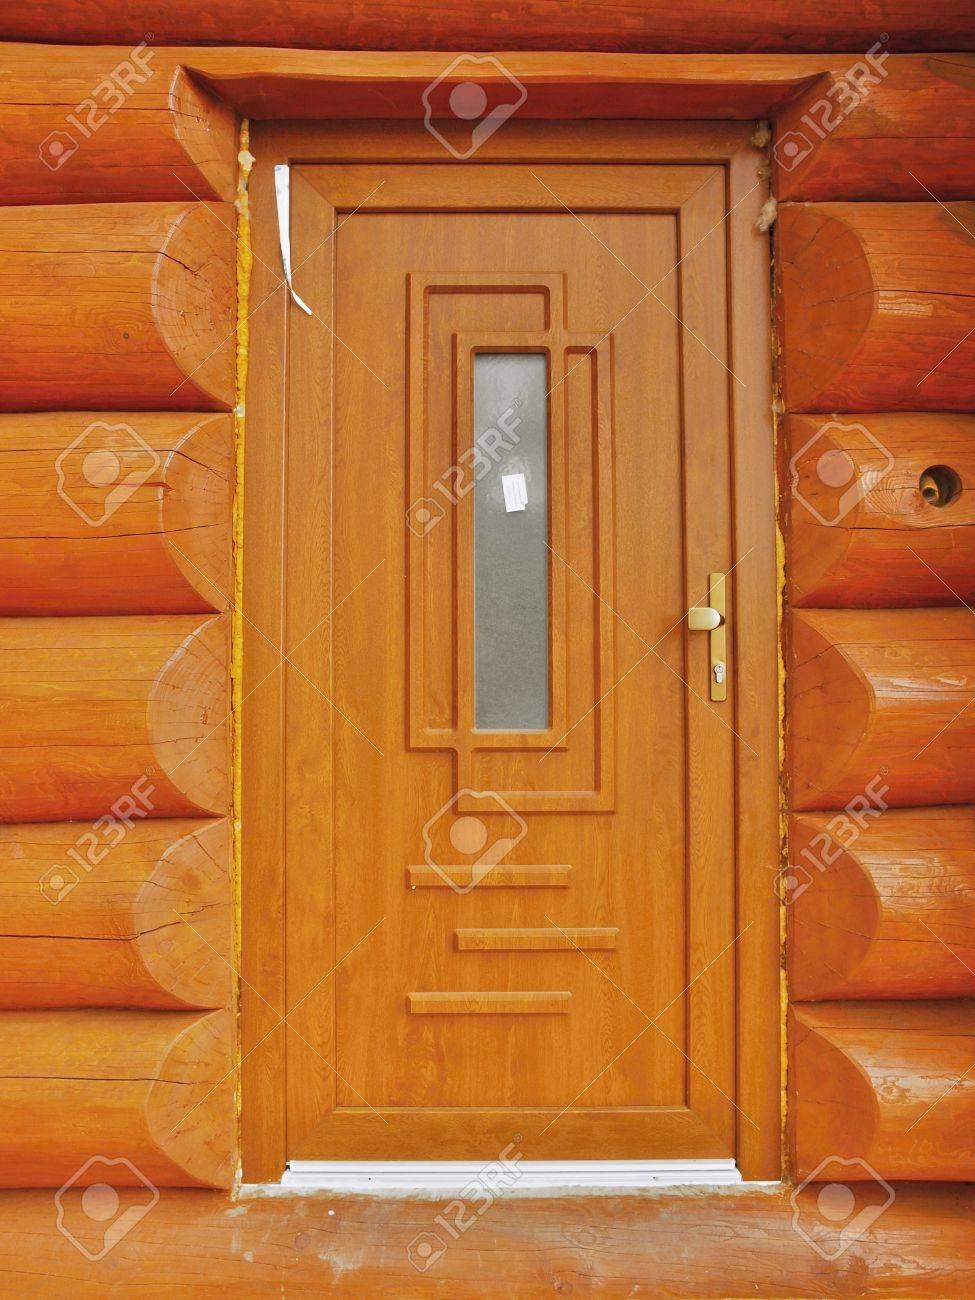 Detail Neu Gebautes Tür In Holzbalken Kabinenwand Gebaut. Lackiertem ...